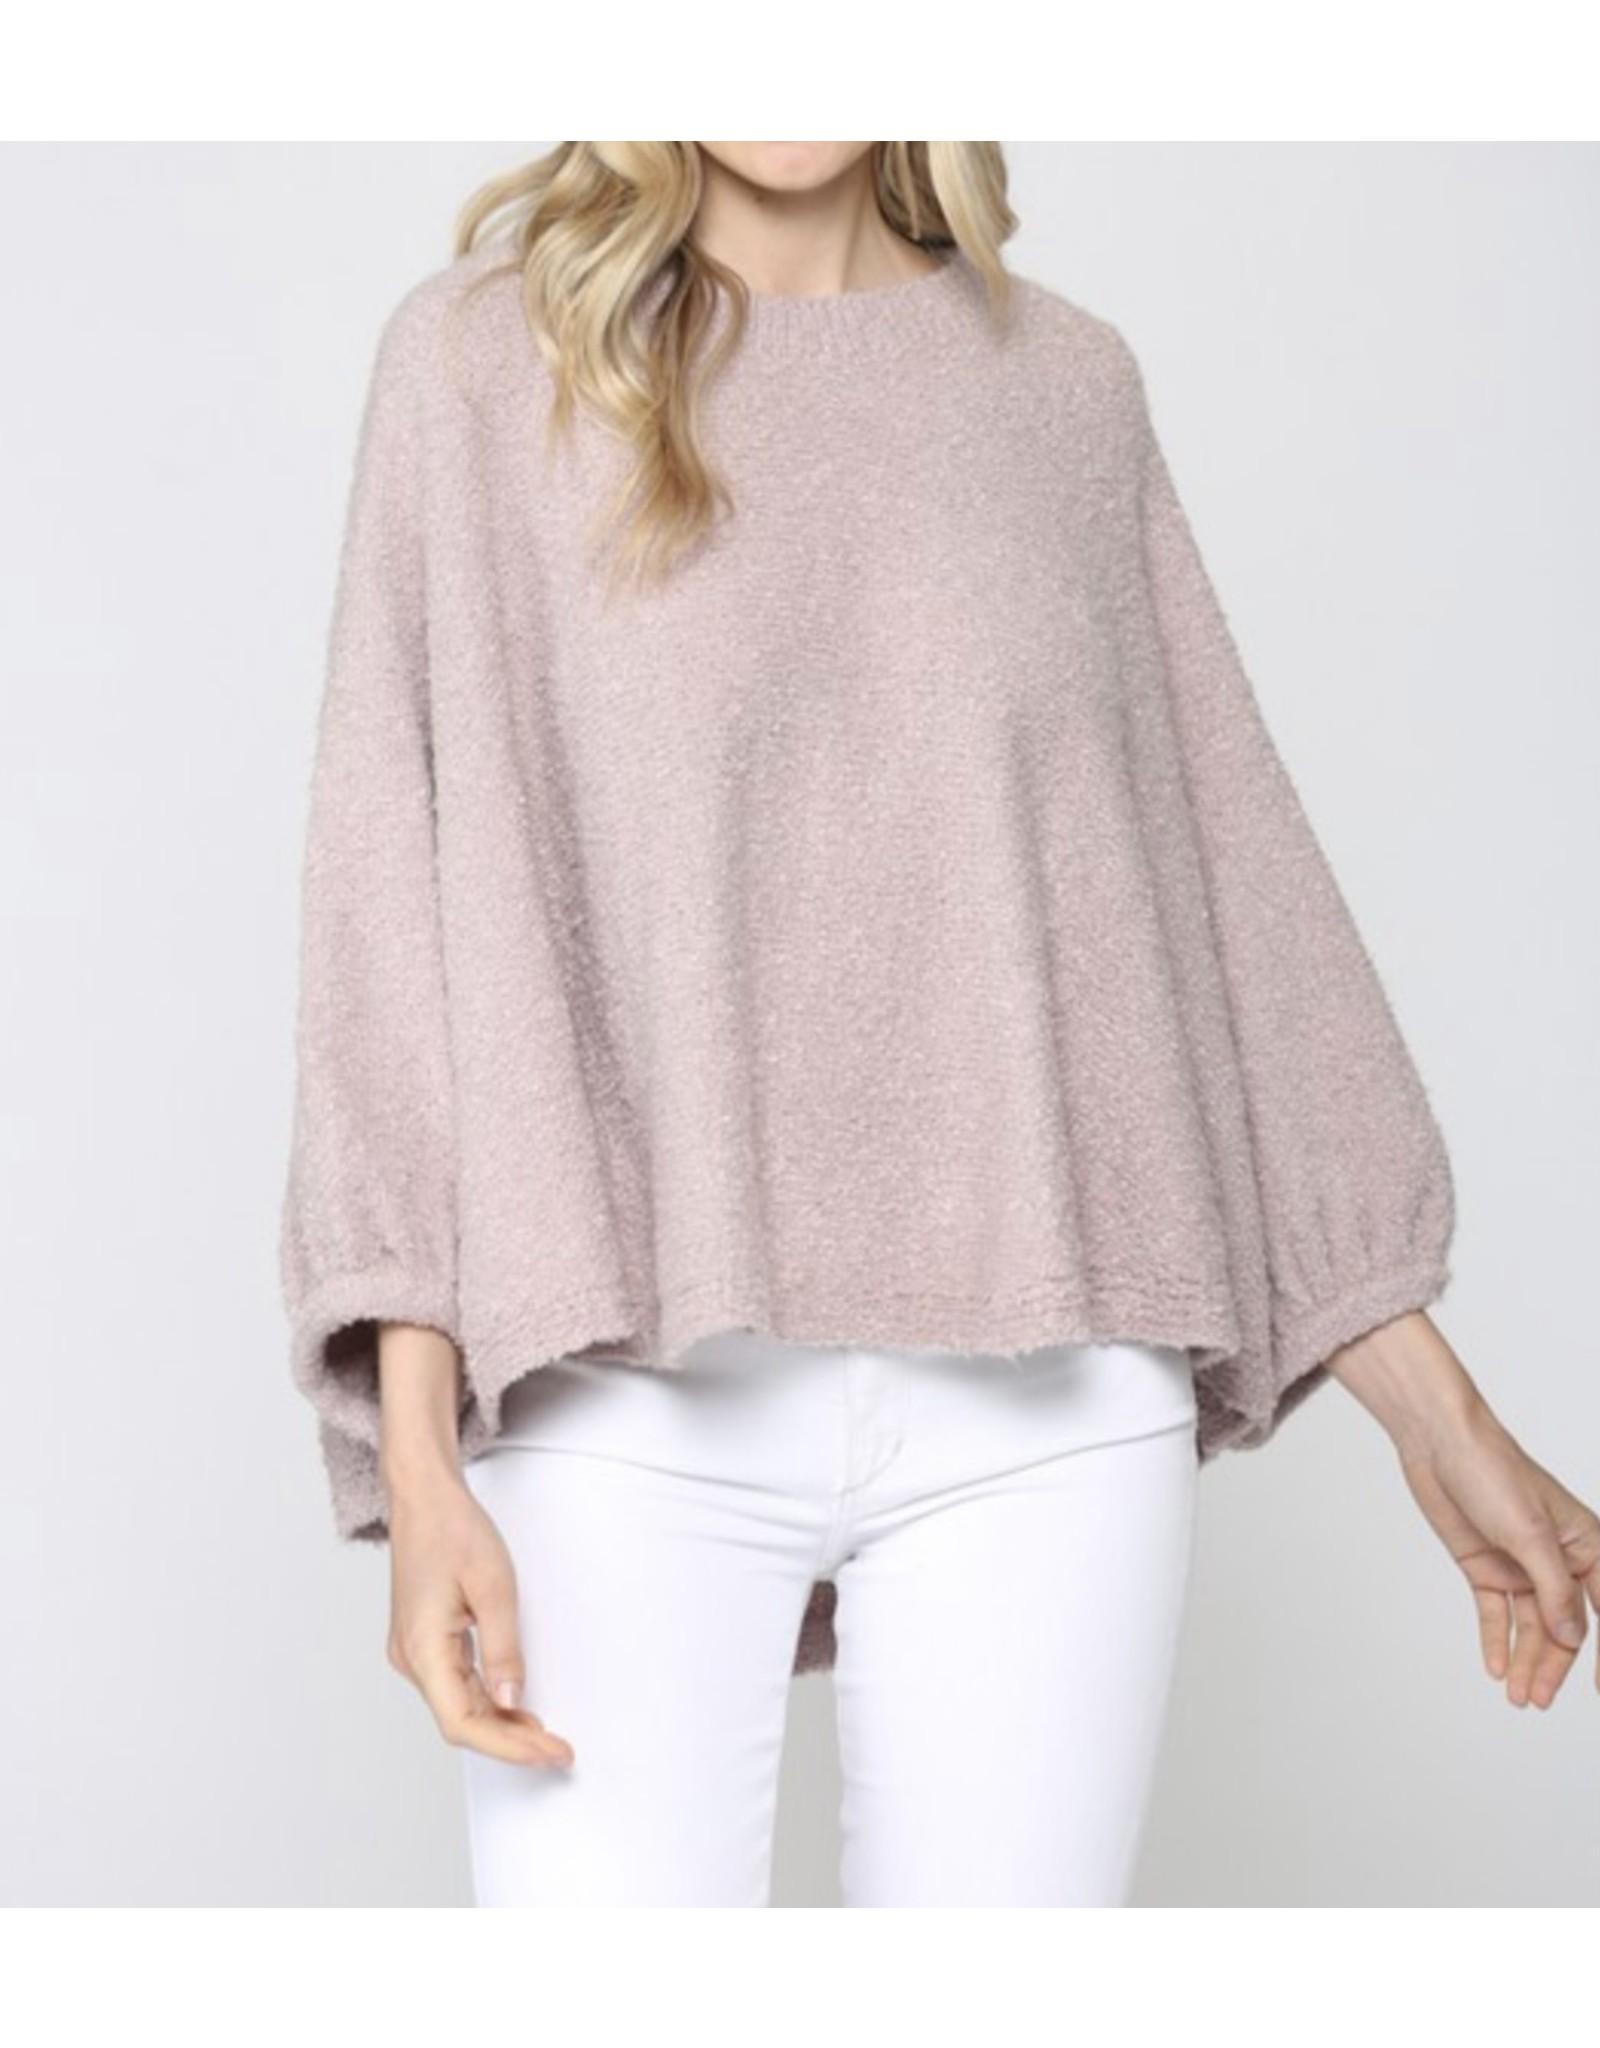 Poncho Sweater - Blush